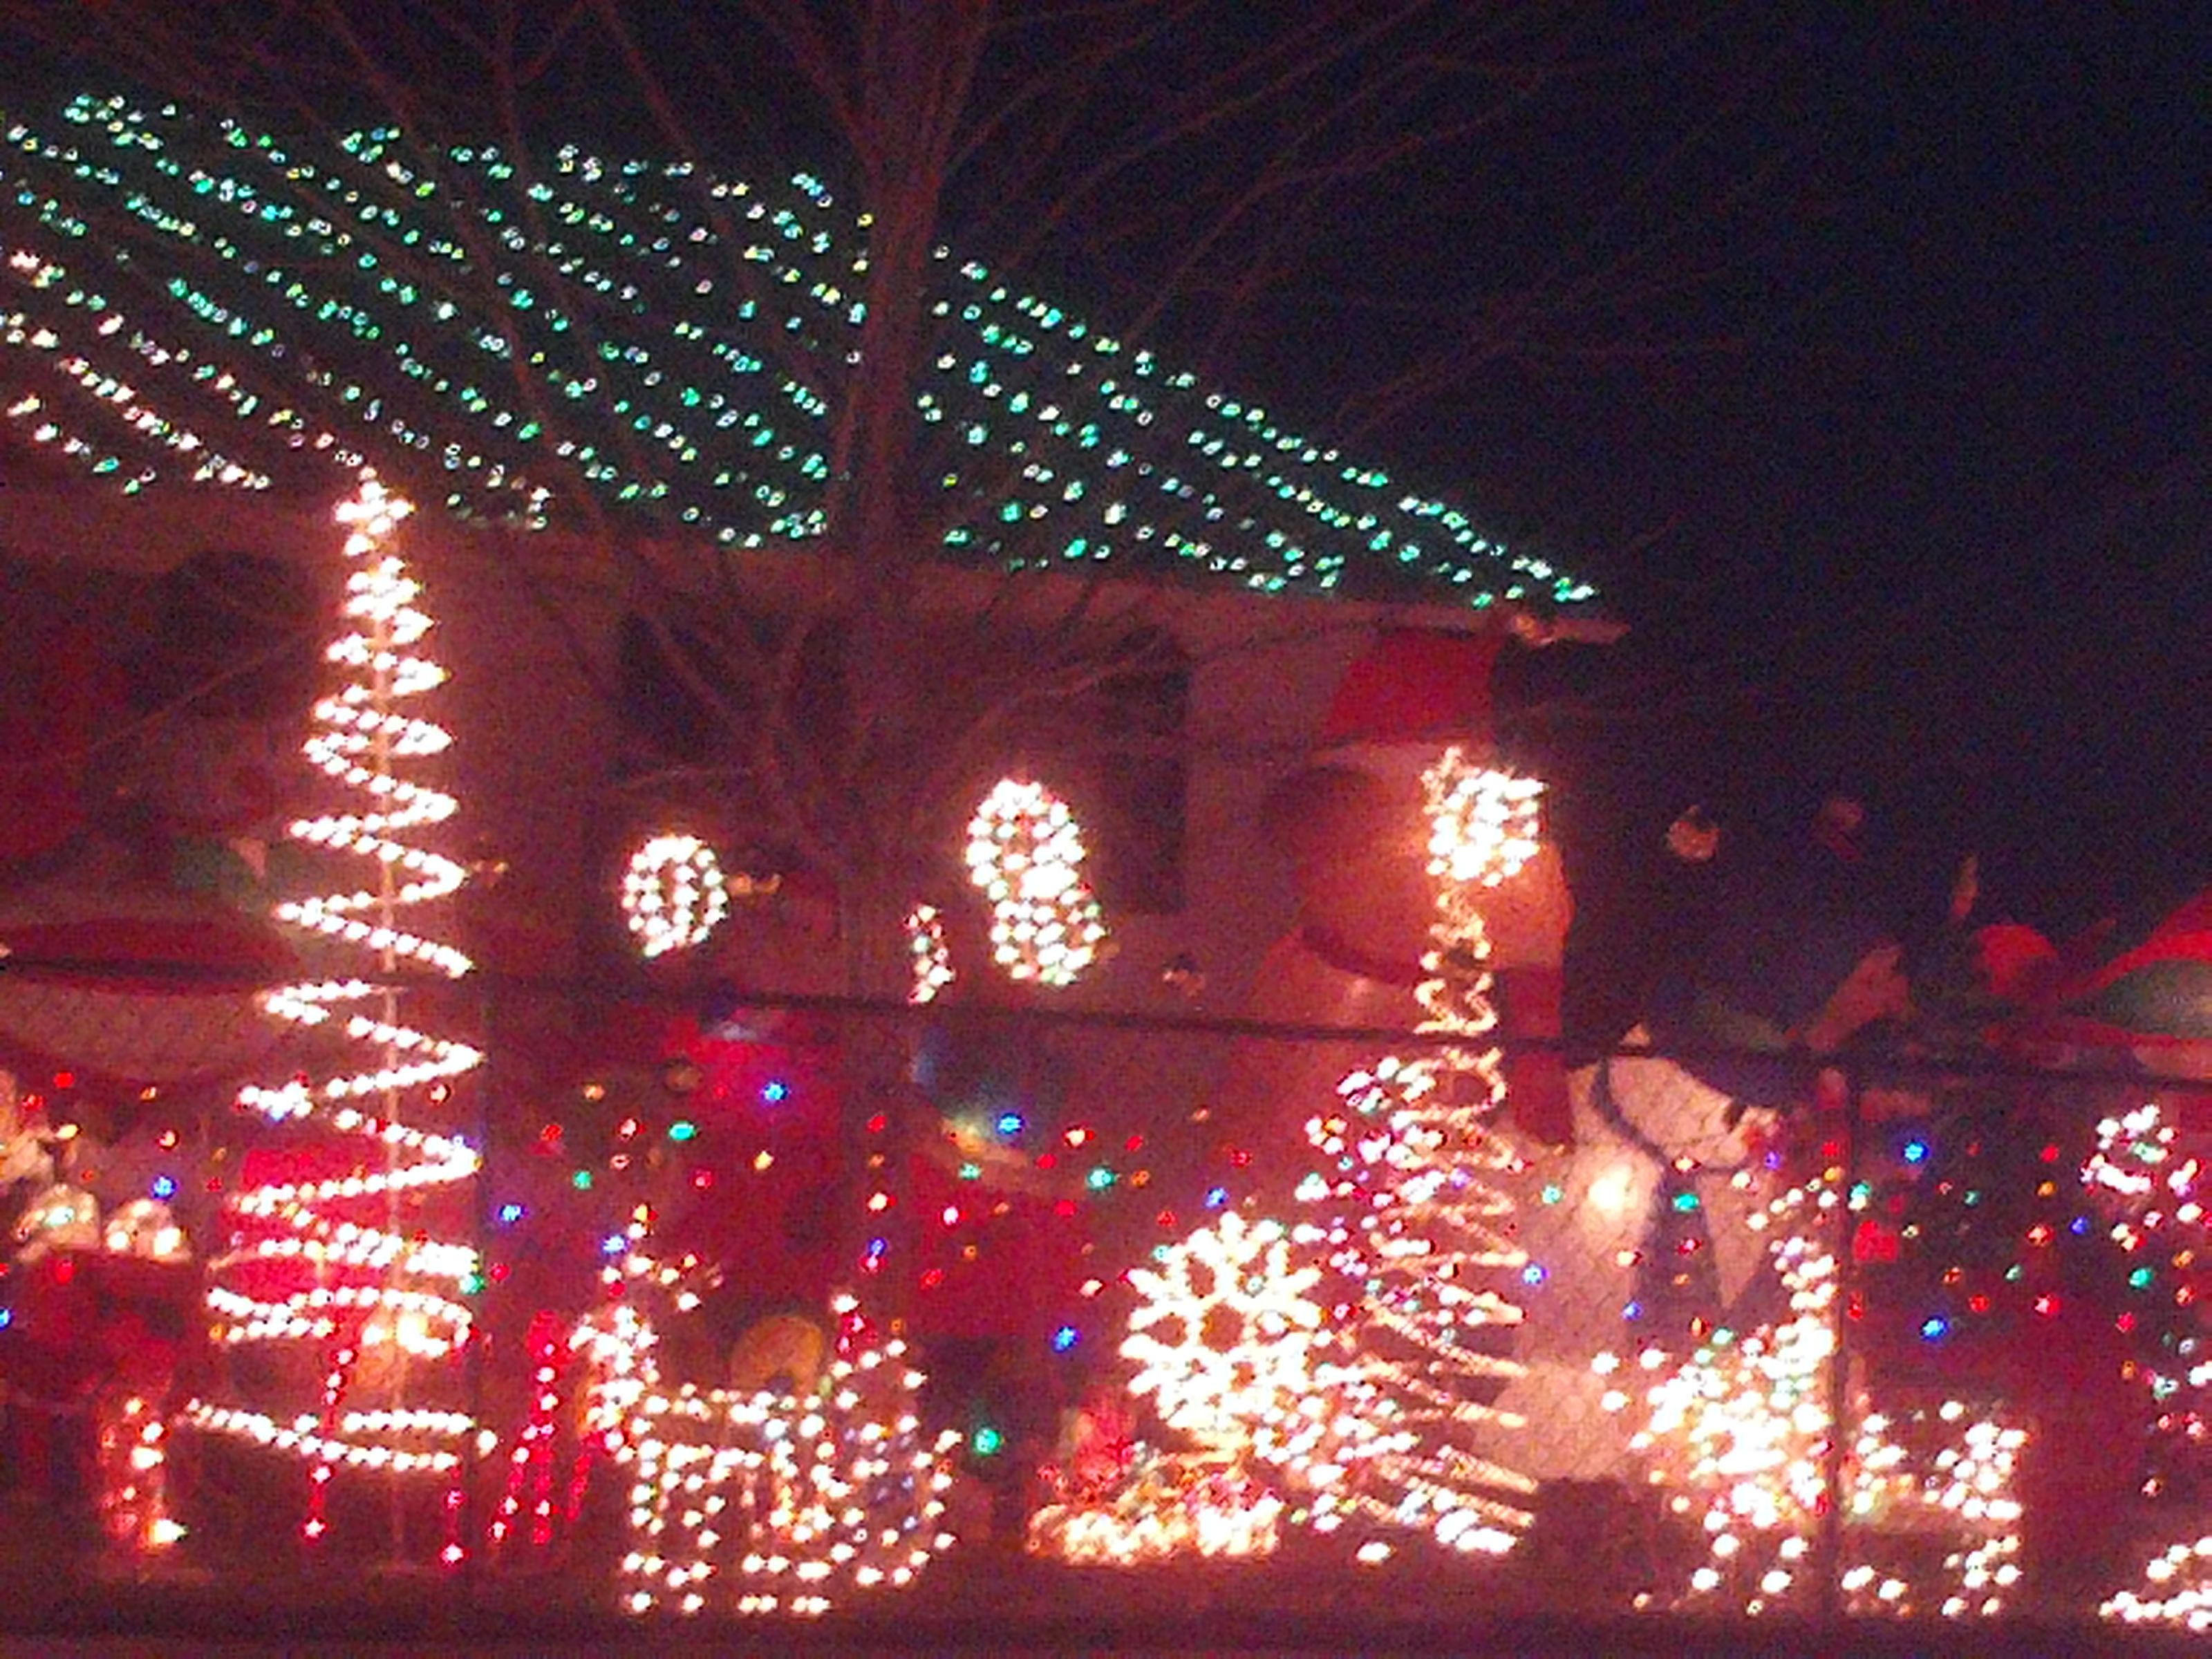 Christmas Lights Boise.Pt 189 Dec 2014 Nampa Idaho Christmas Lights Pts 1 500